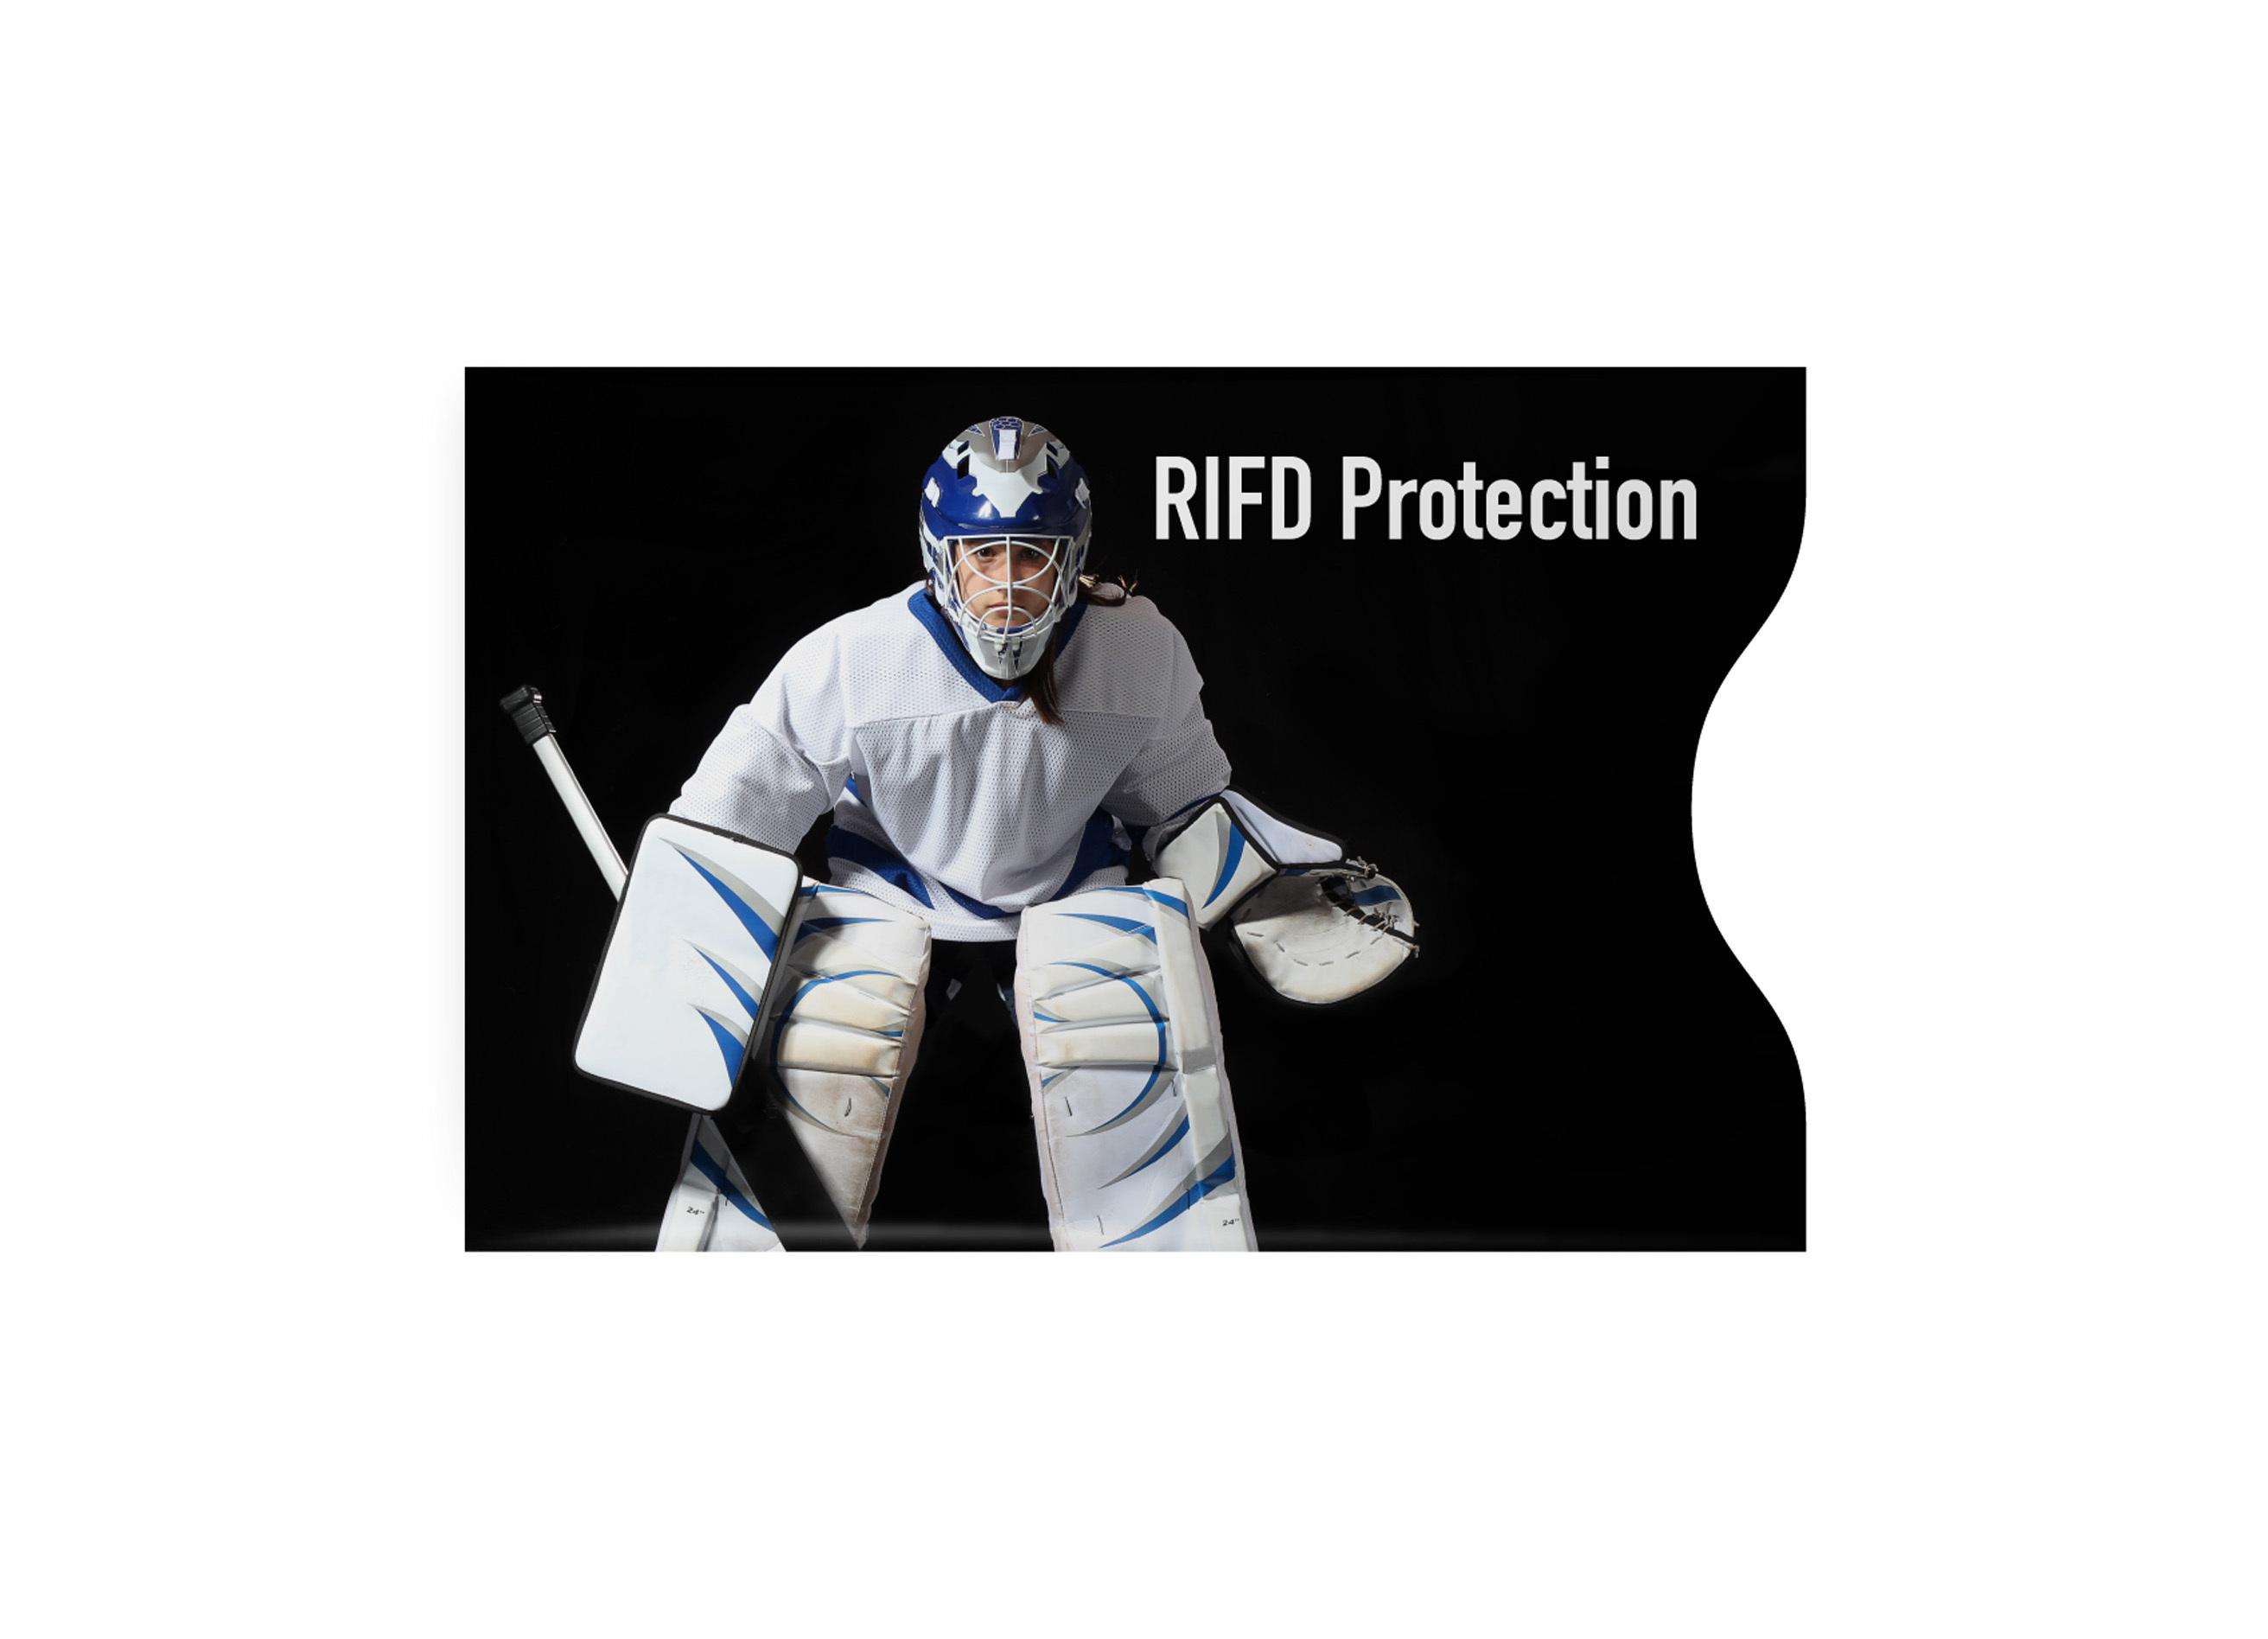 Protège-carte anti RFID